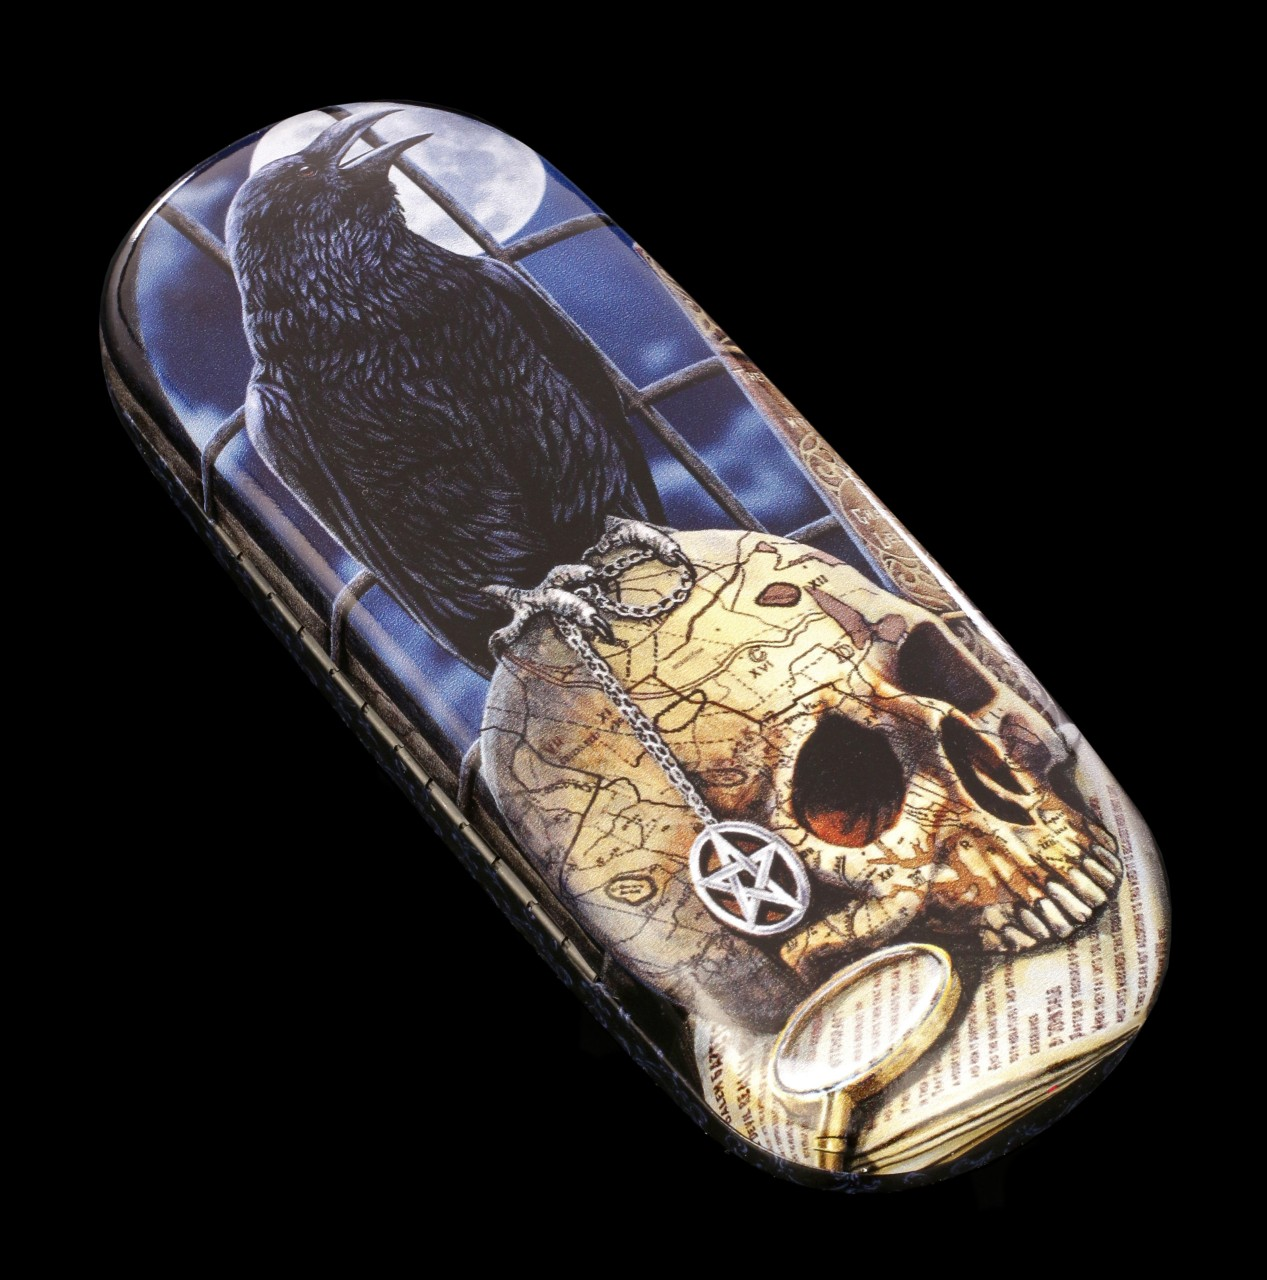 Glasses Case with Raven and Skull - Salem